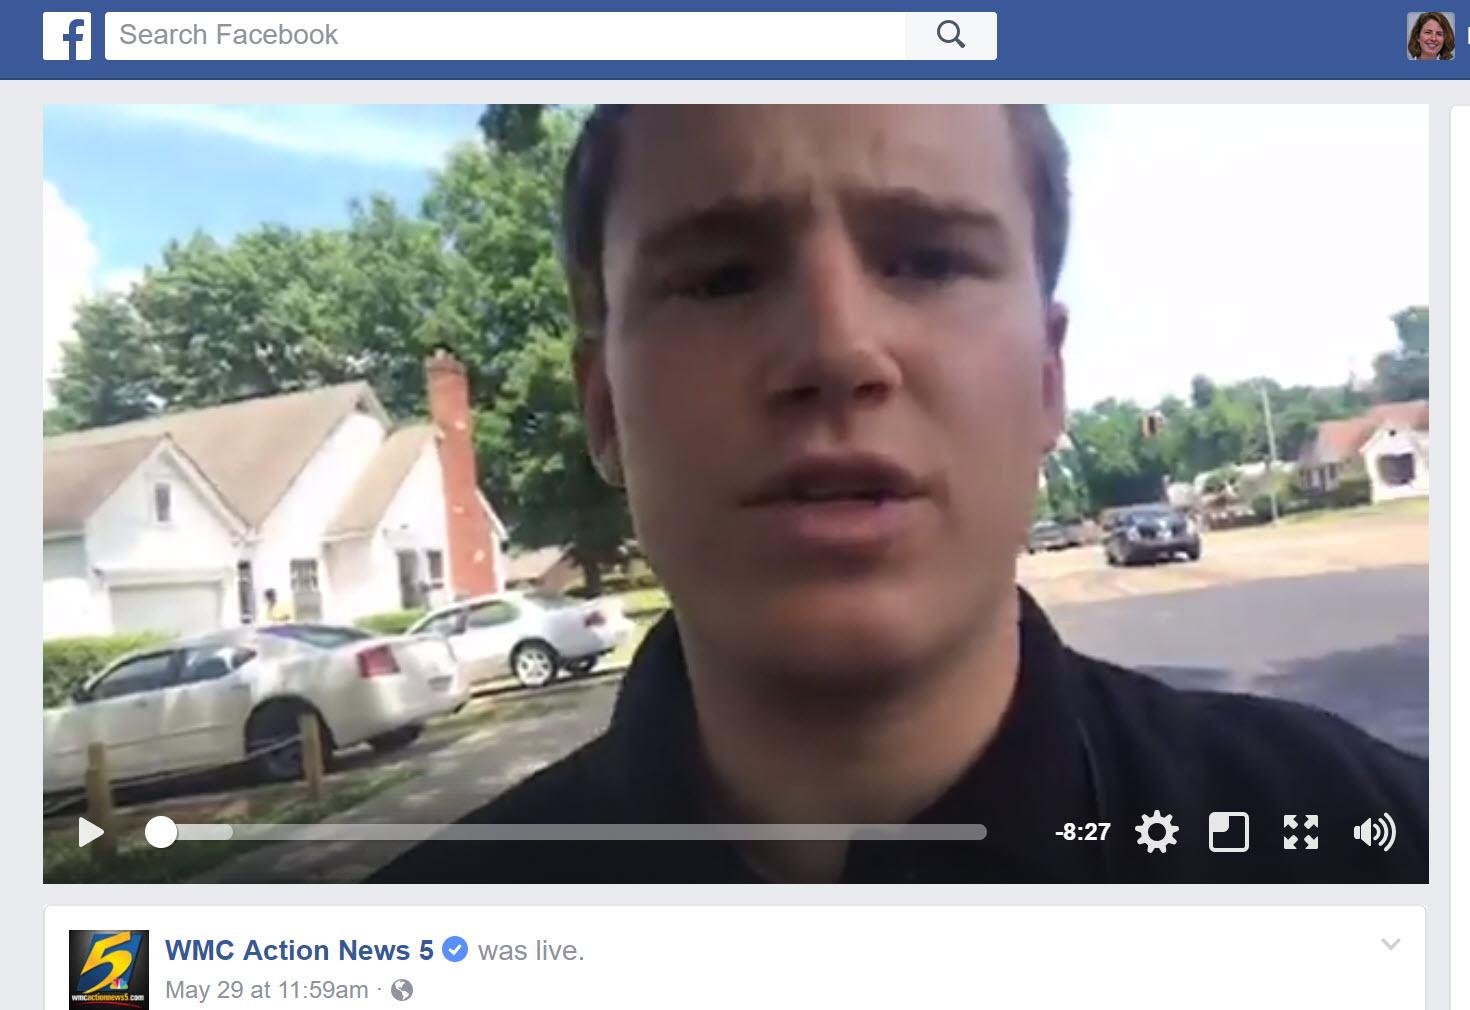 Using Facebook Live for better TV |